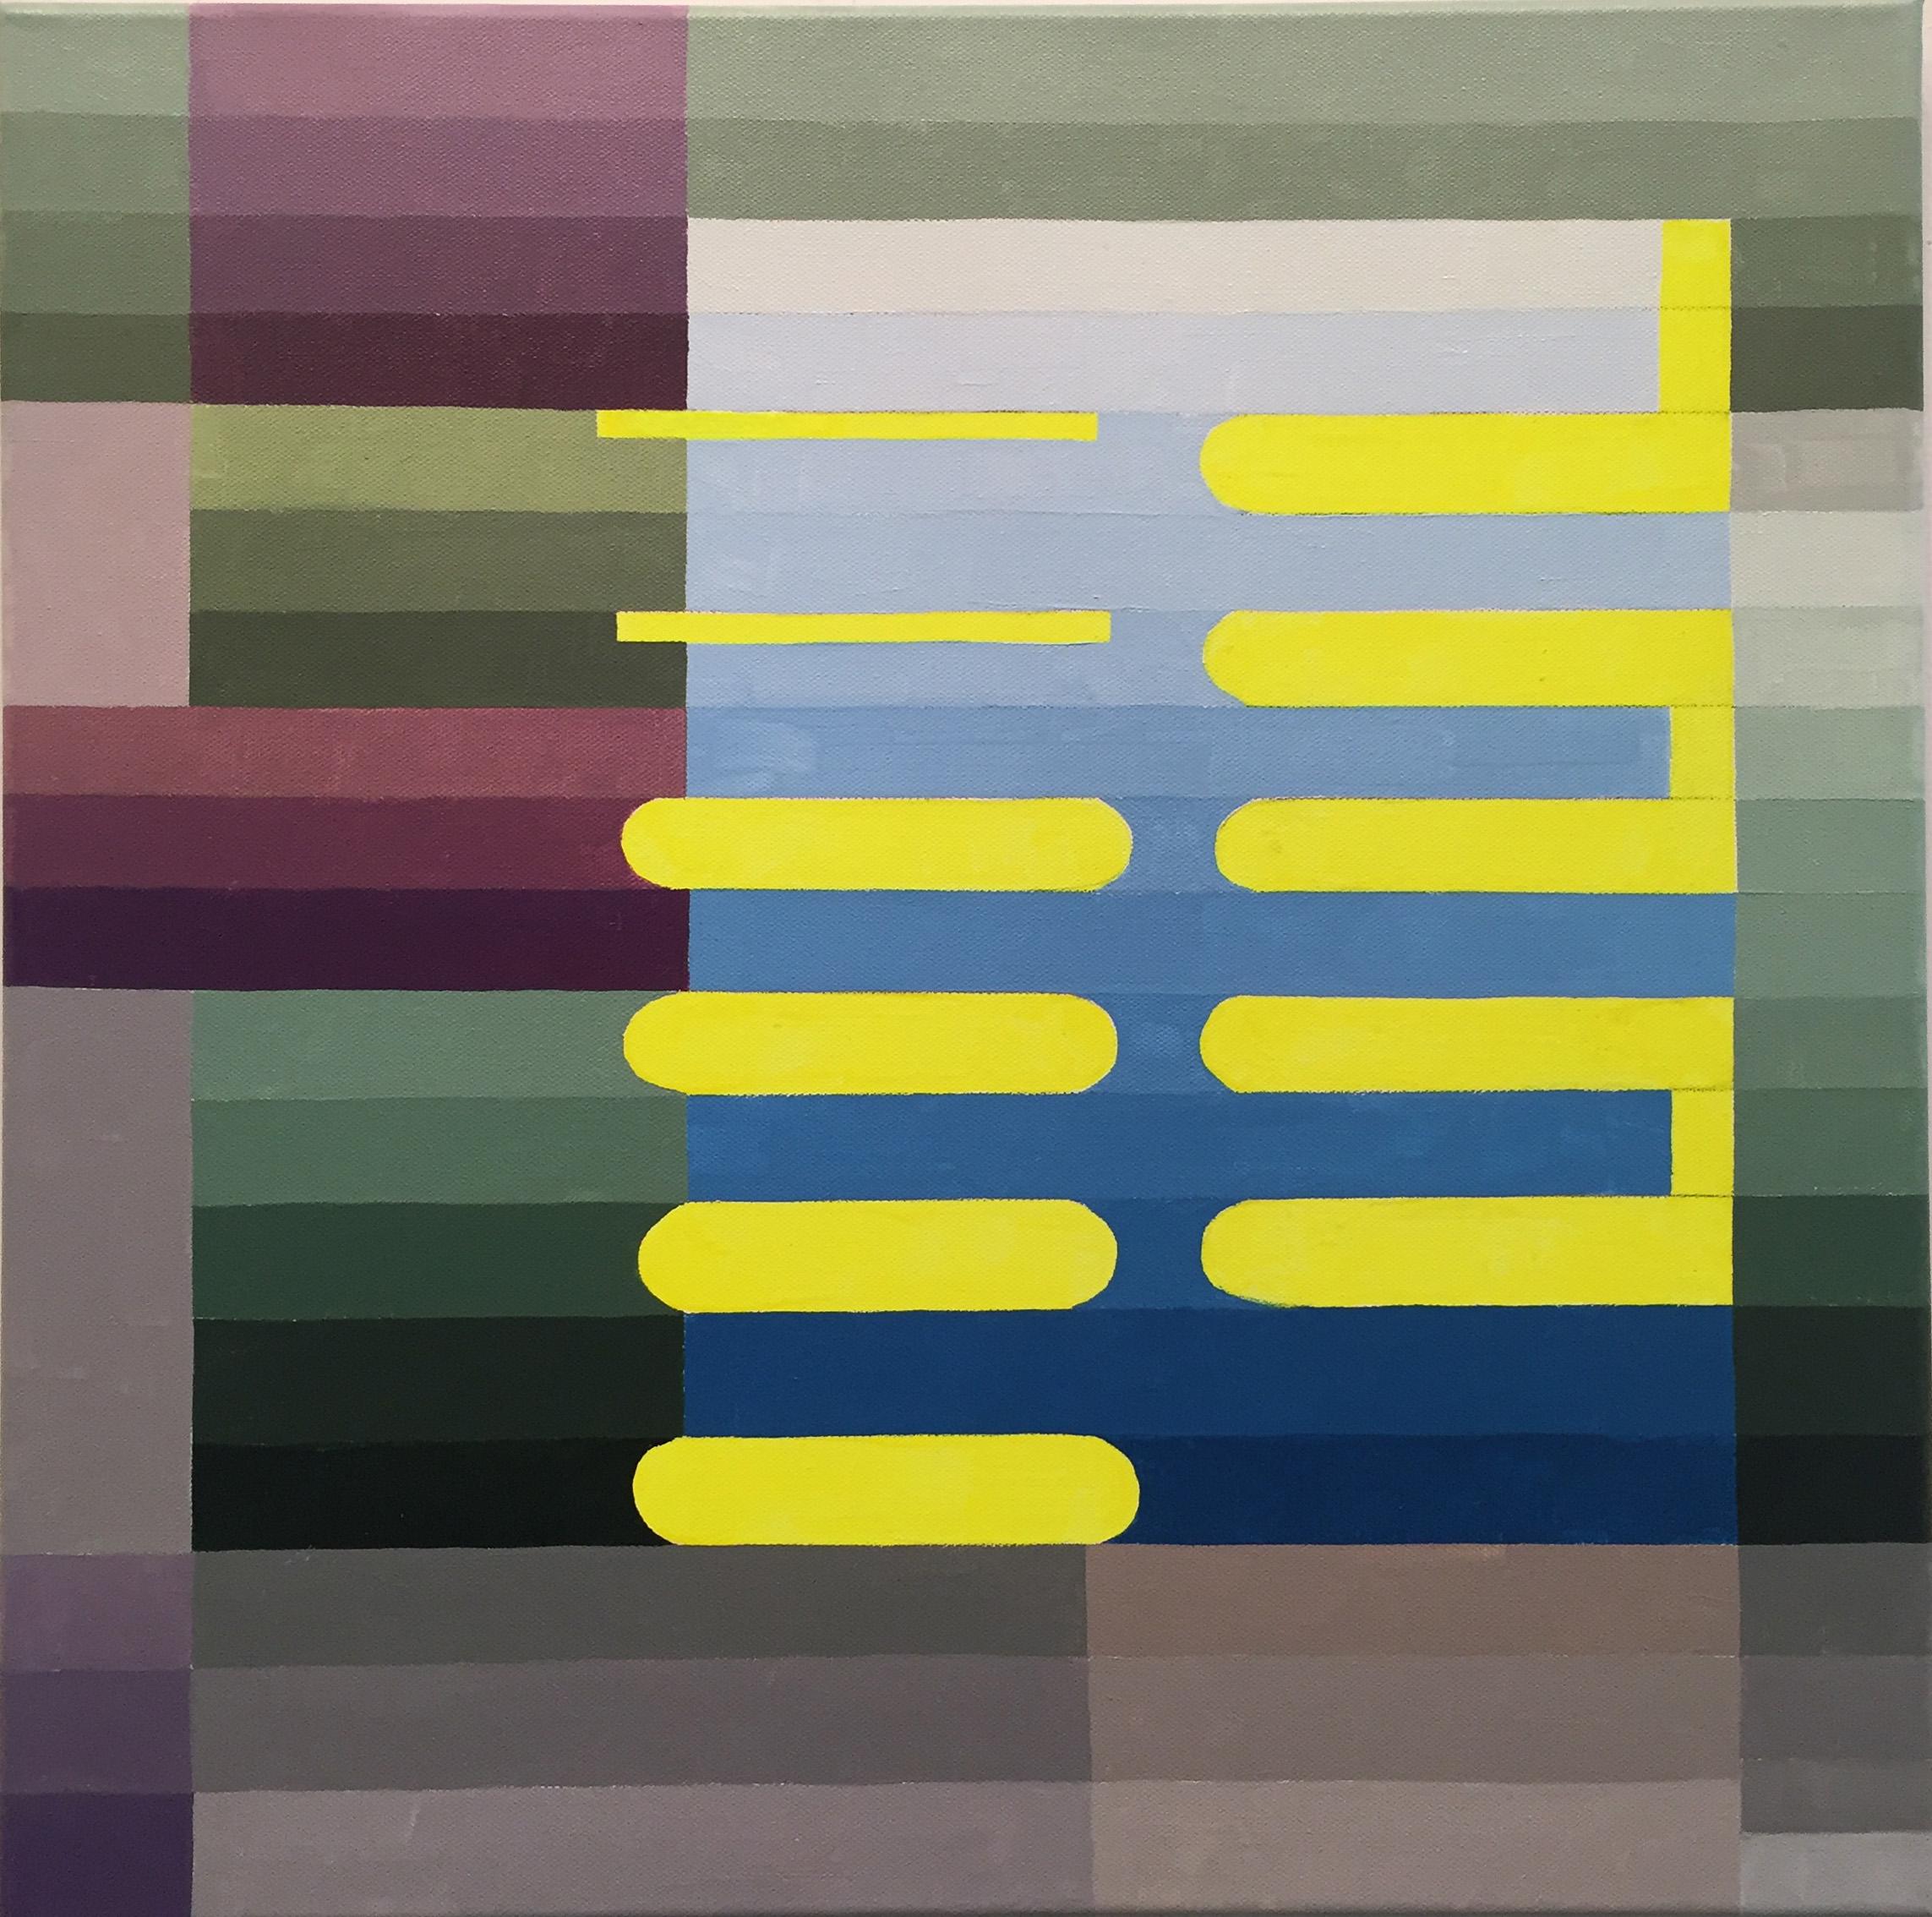 oil and acrylic on canvas 24x24, 2018